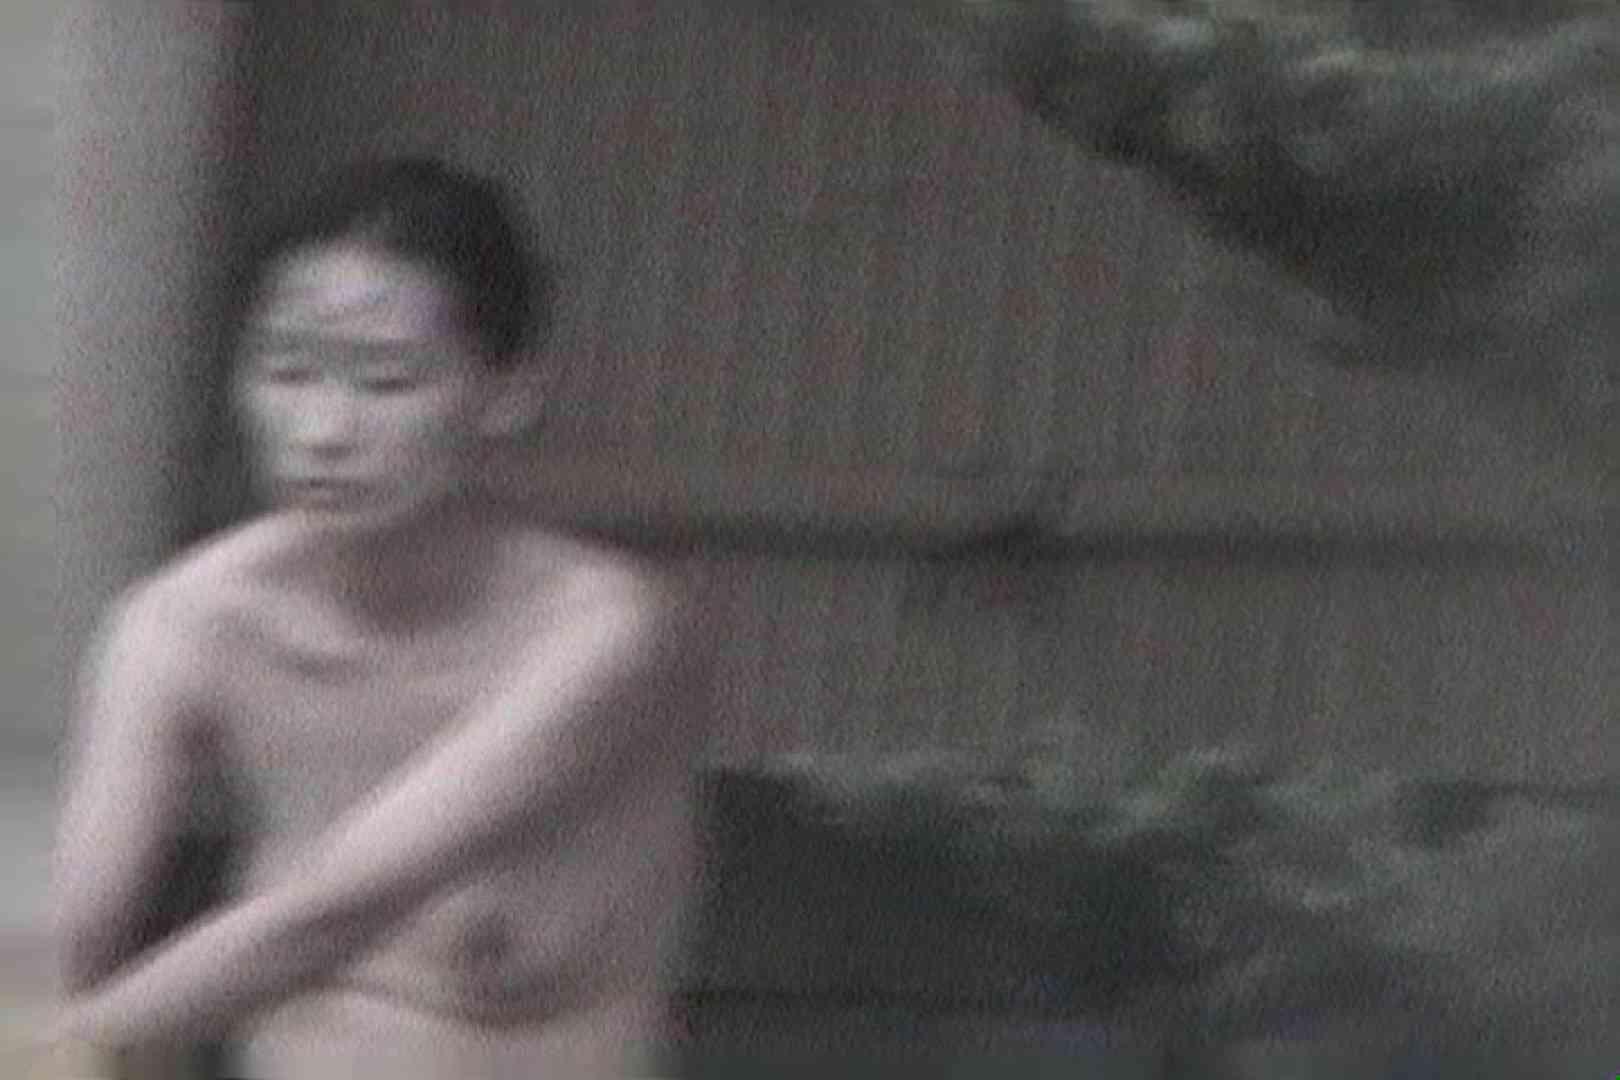 Aquaな露天風呂Vol.557 露天風呂編 | 盗撮シリーズ  100PIX 69